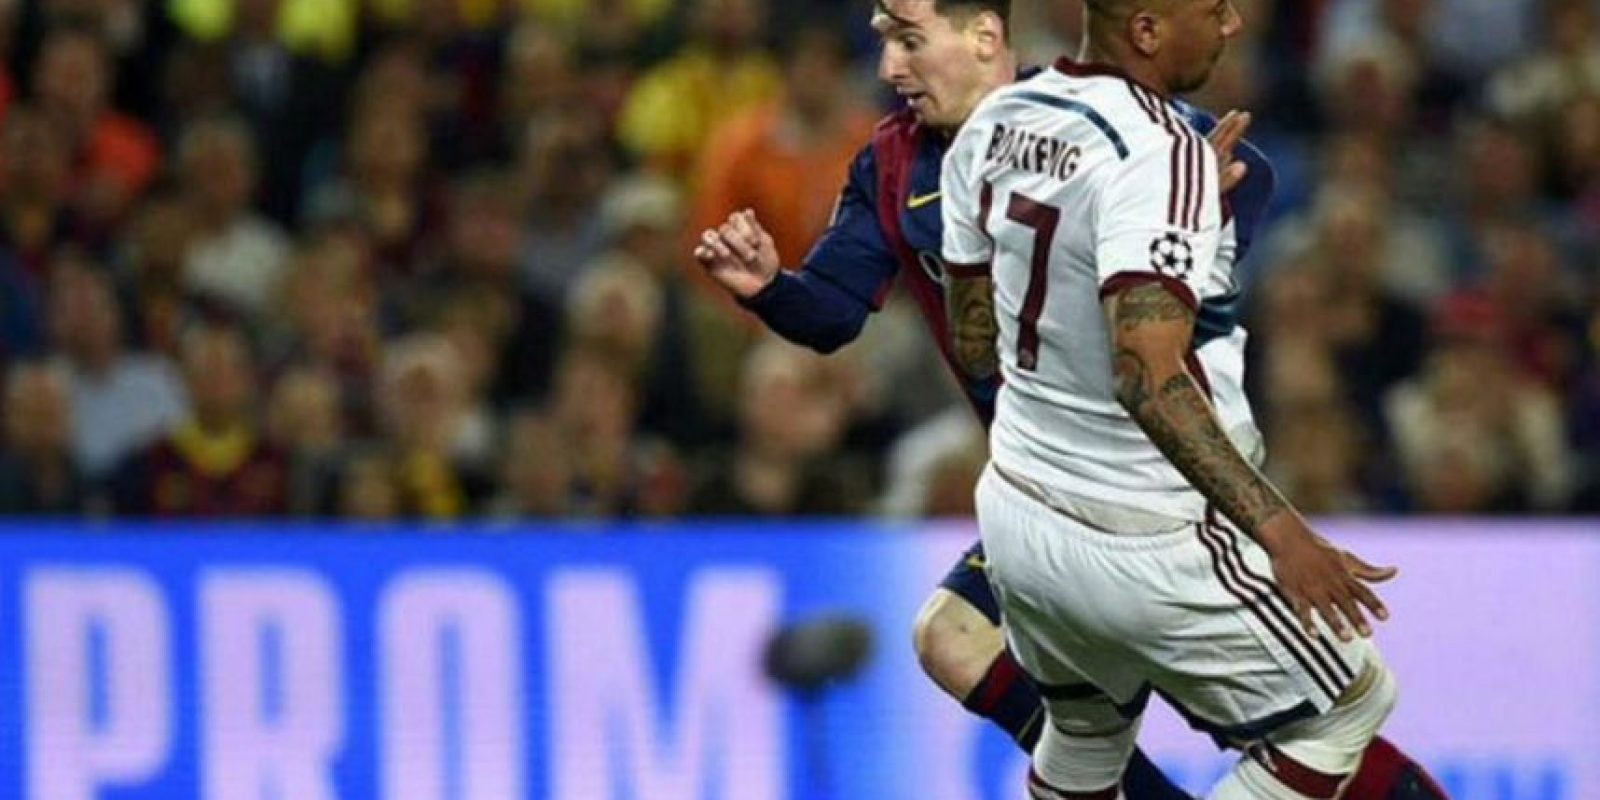 Boateng no pudo detener a Messi y el argentino hizo el segundo gol del Barcelona. Foto:Twitter